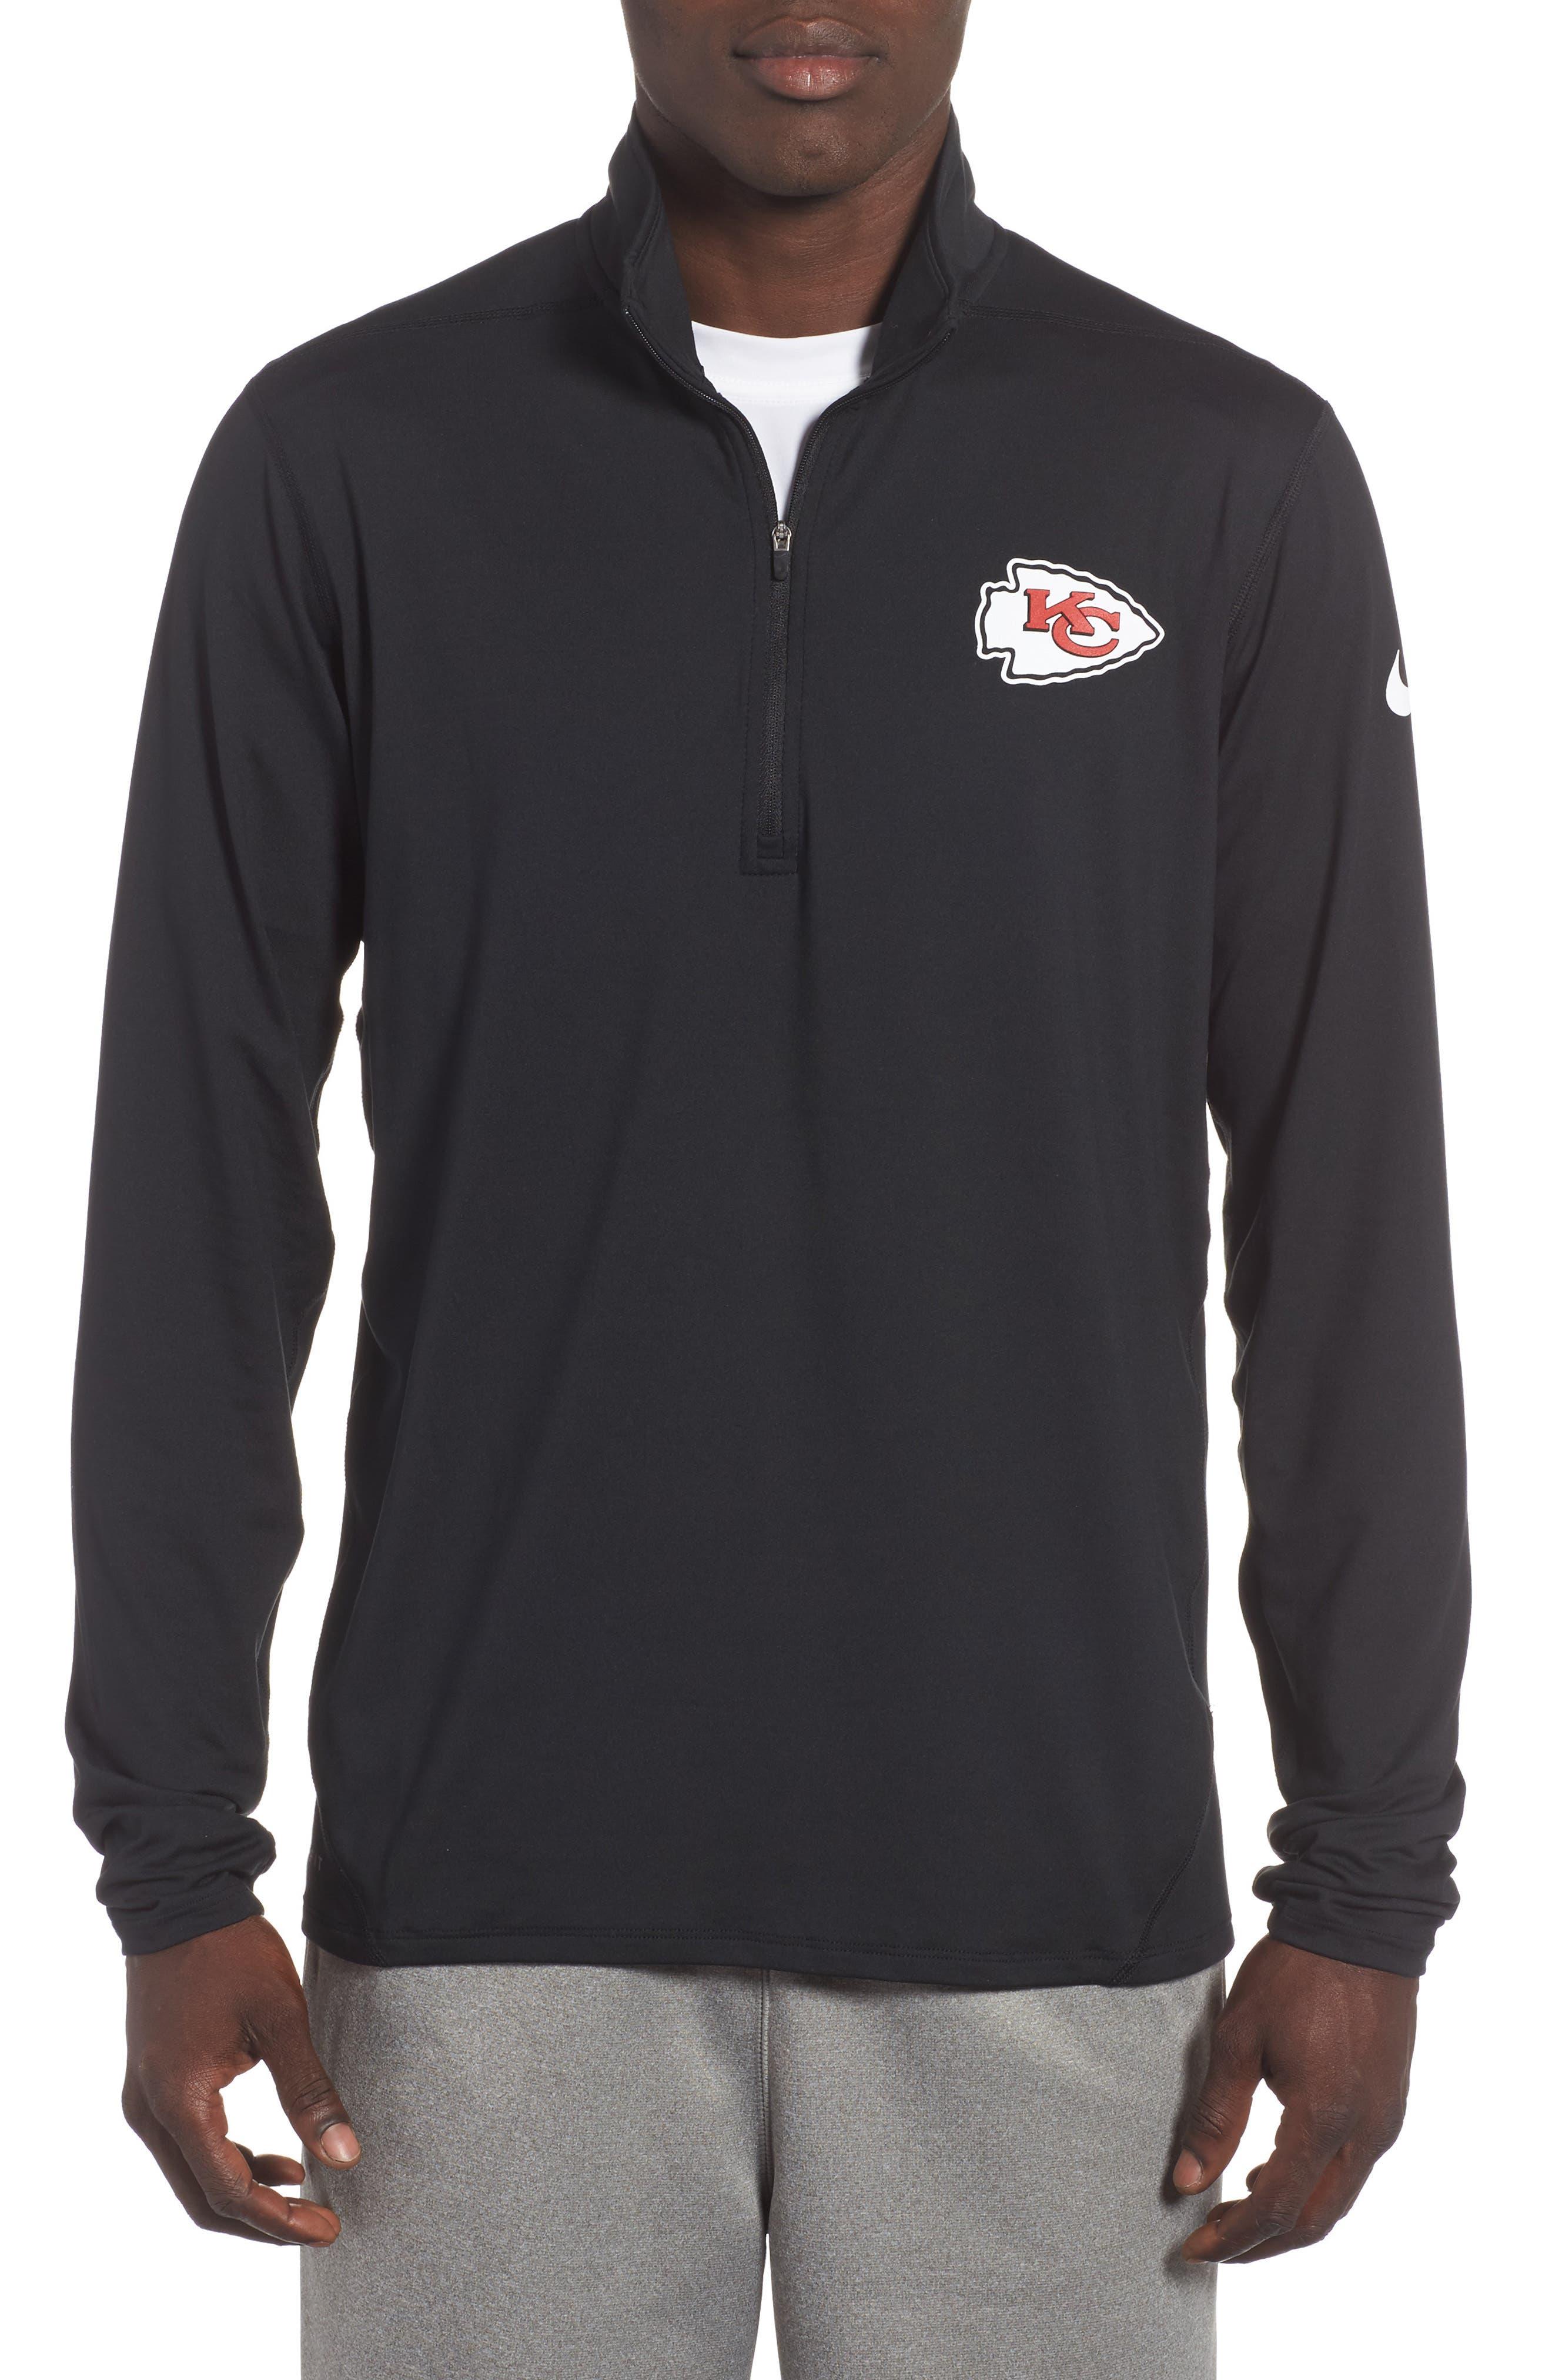 Alternate Image 1 Selected - Nike NFL Team Element Quarter Zip Pullover